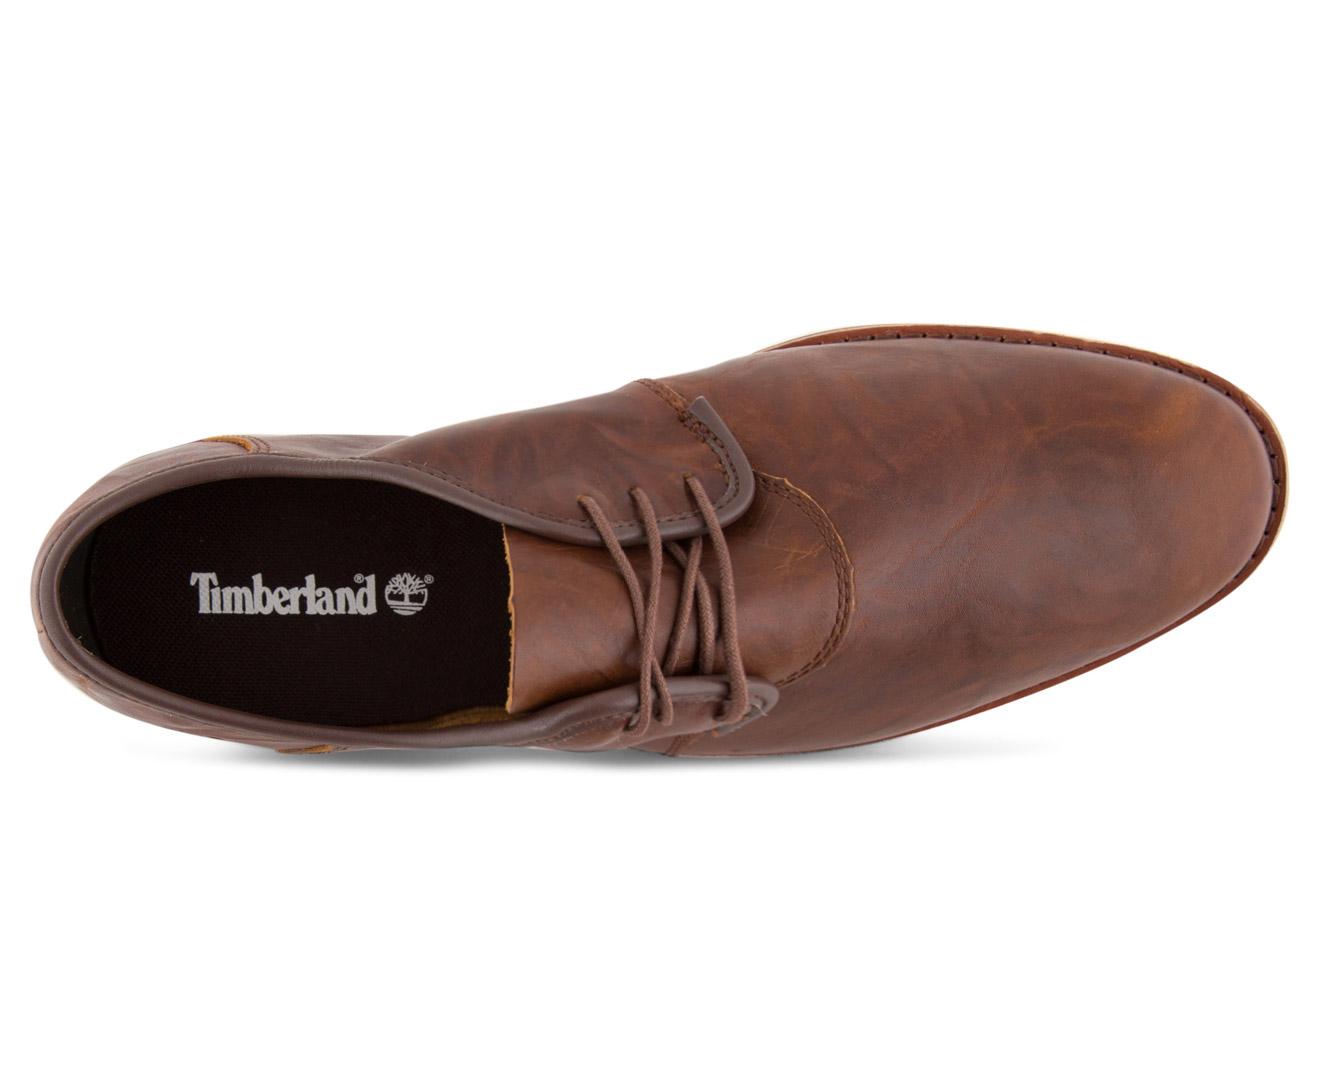 Timberland Menns Revenia Skinn Oxford Sko T5cQPMOh5F